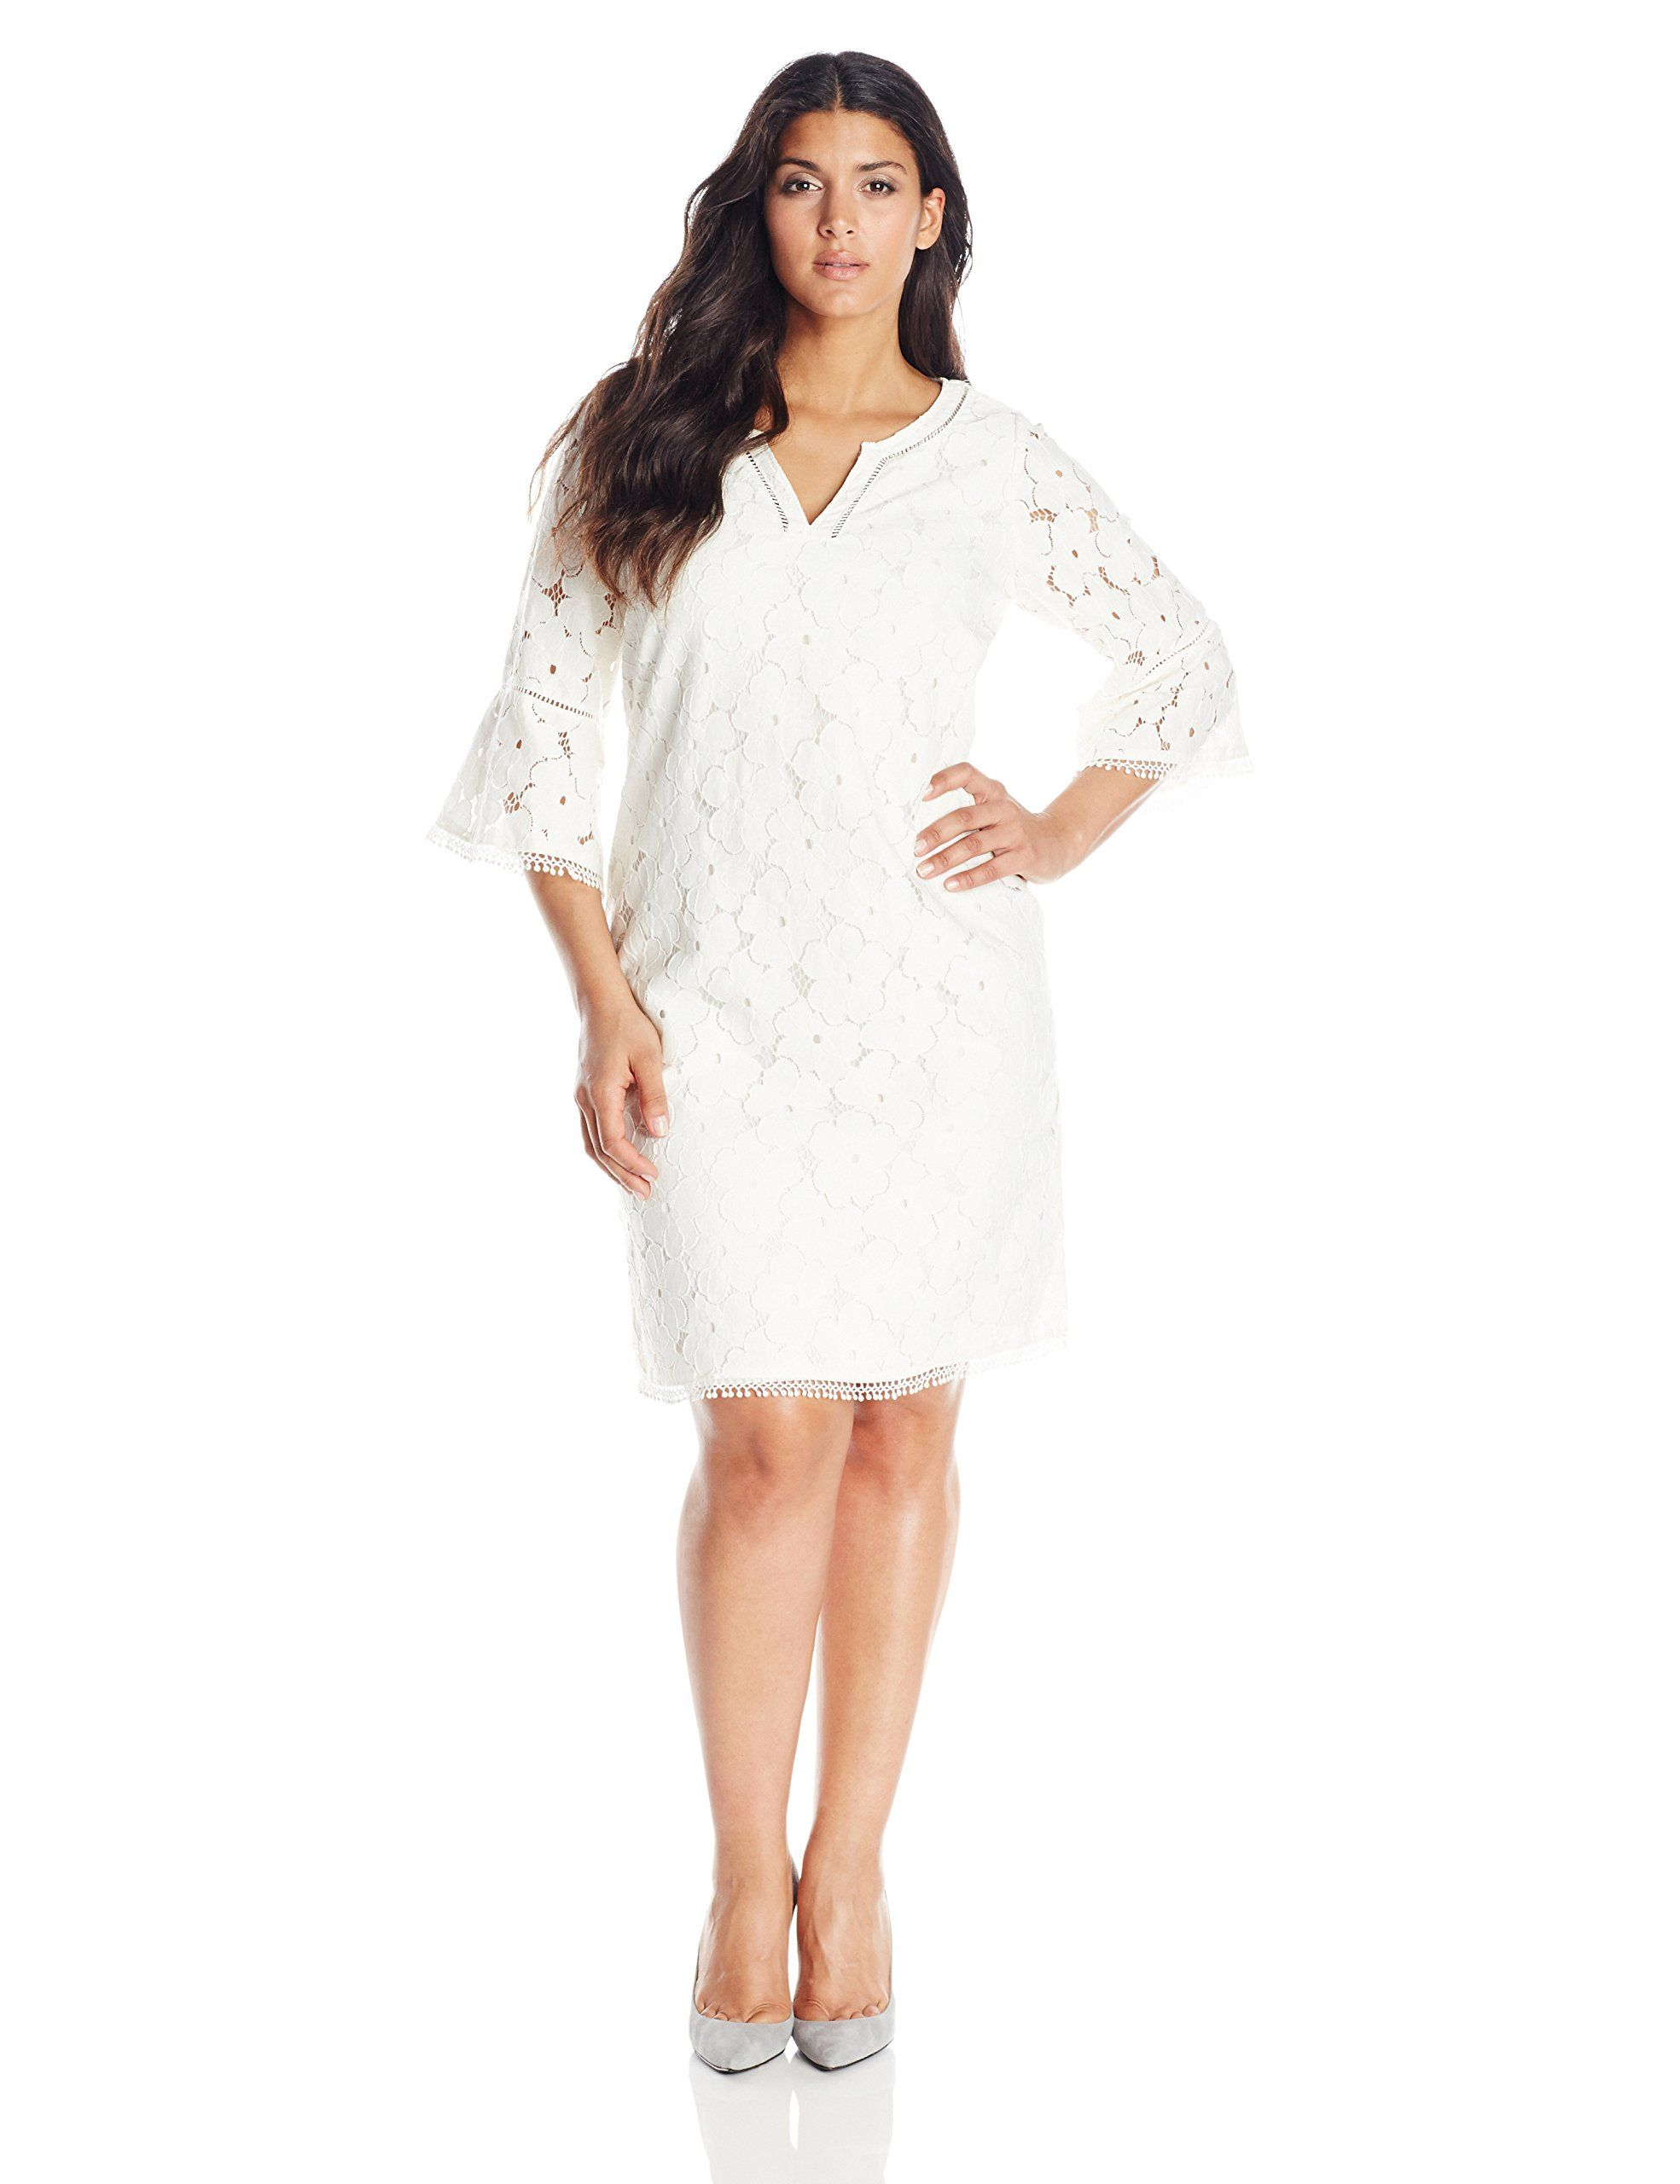 b22eebba3e Adrianna Papell Women s Plus-Size 3 4 Sleeve V Neck Lace Shift Dress ...